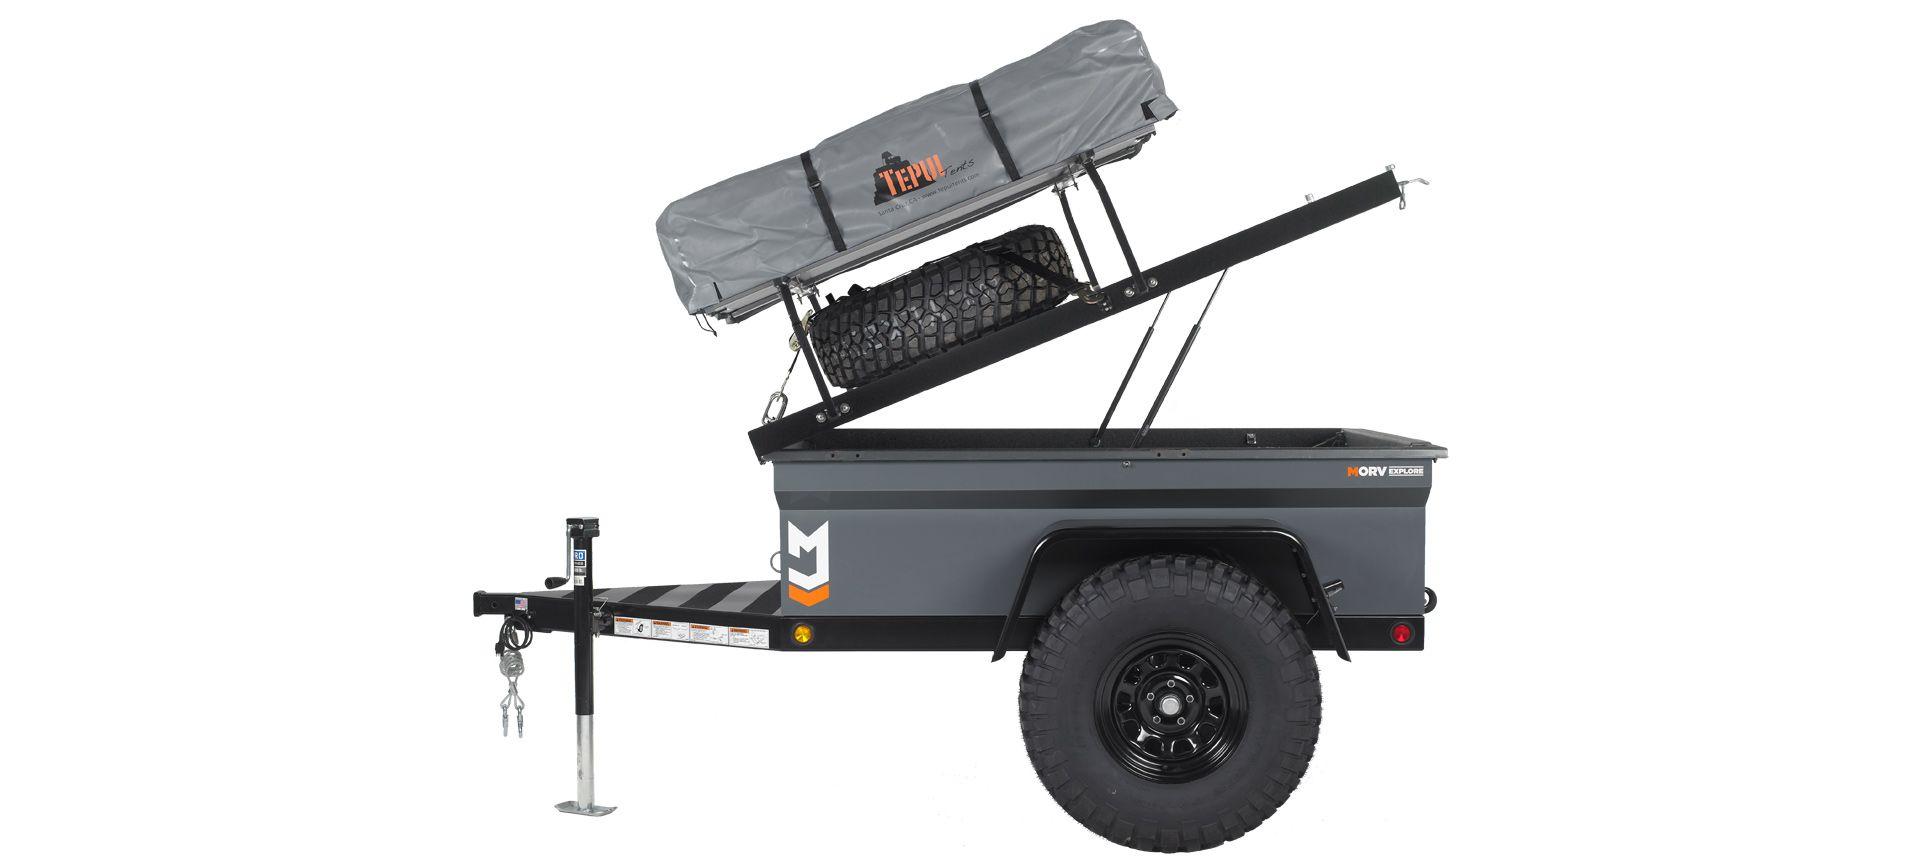 MORV Explore Manley ORV Company Trailer, Camping trailer